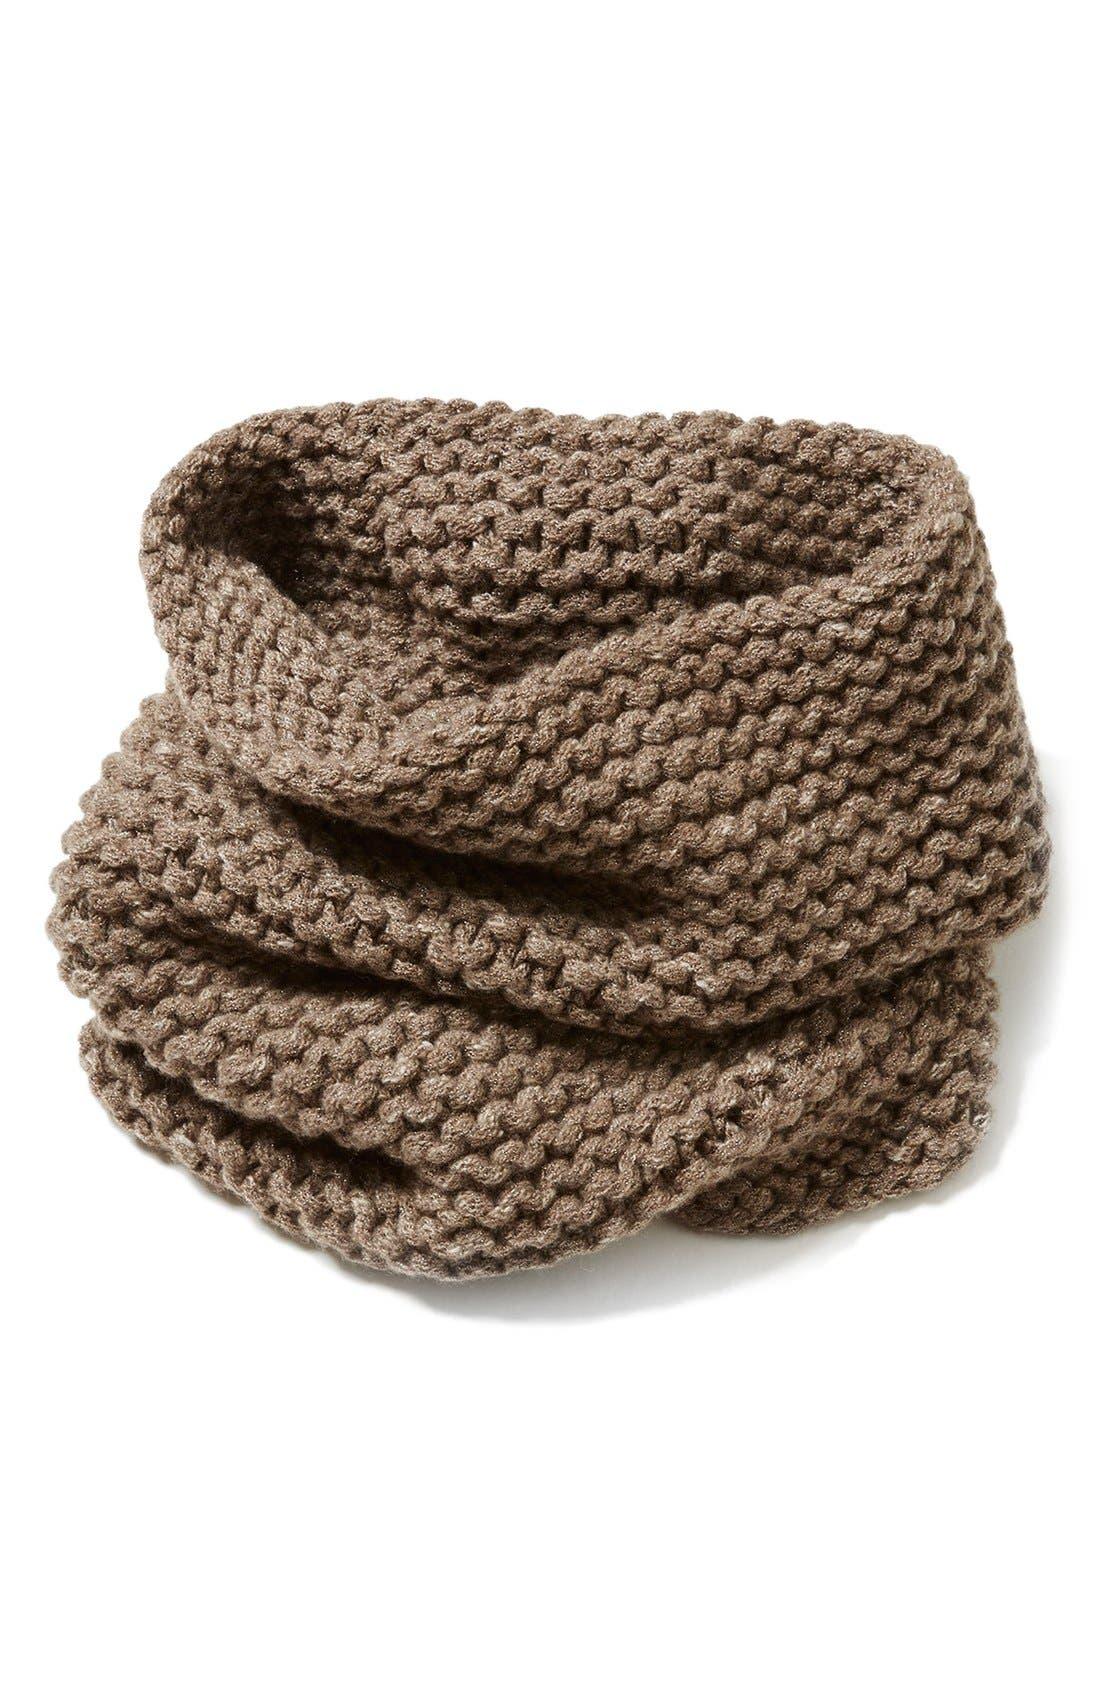 Alternate Image 1 Selected - Lafayette 148 New York Hand Knit Metallic Cashmere Tube Scarf